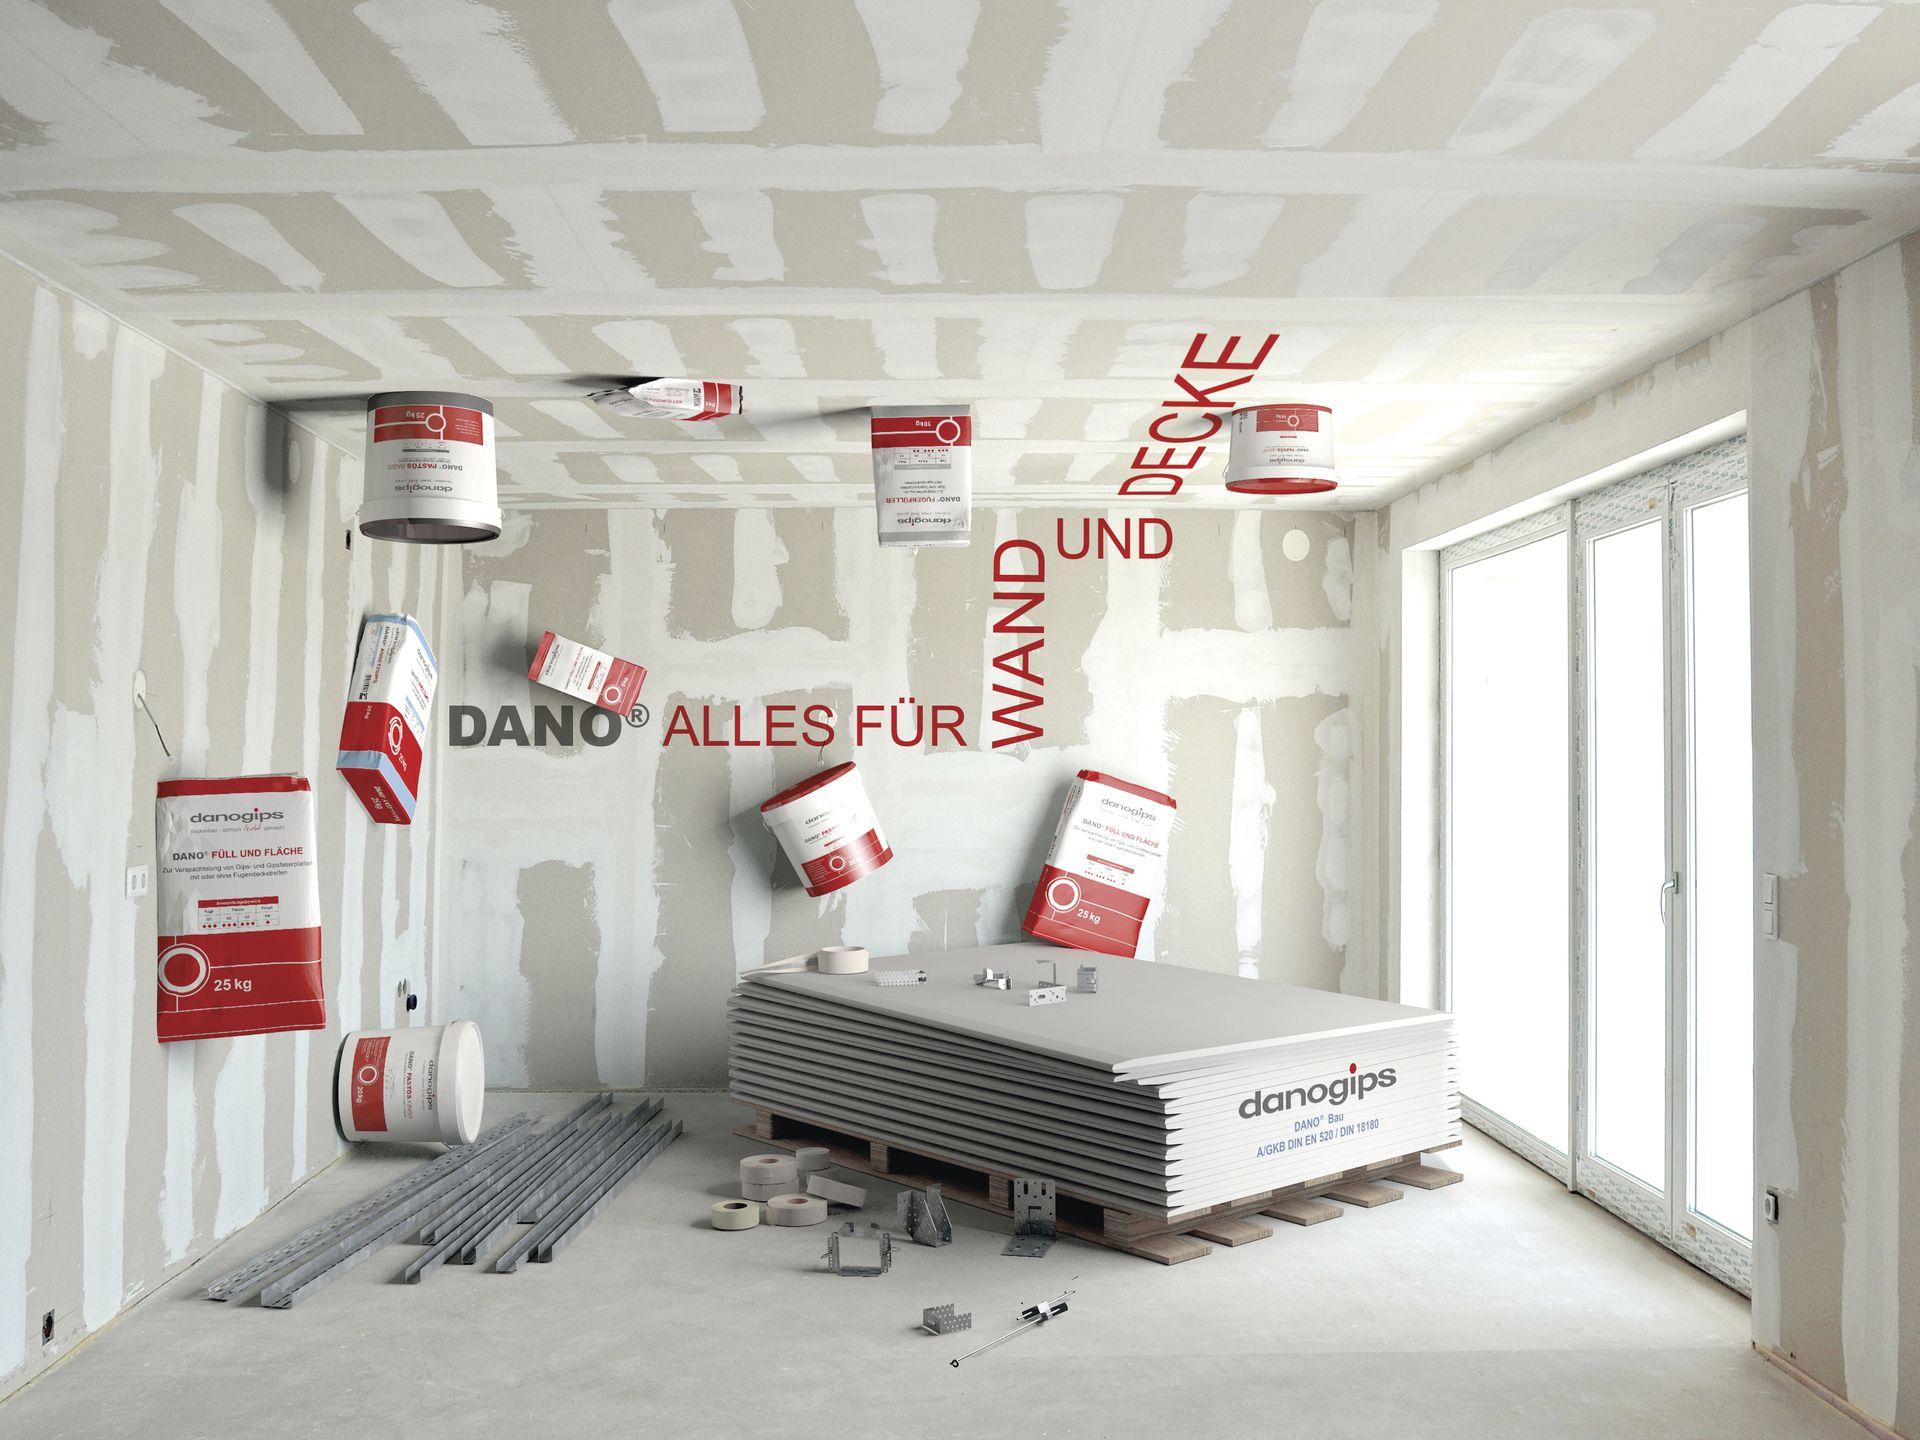 dano® gipsplatten und spachtel - ais-online.de